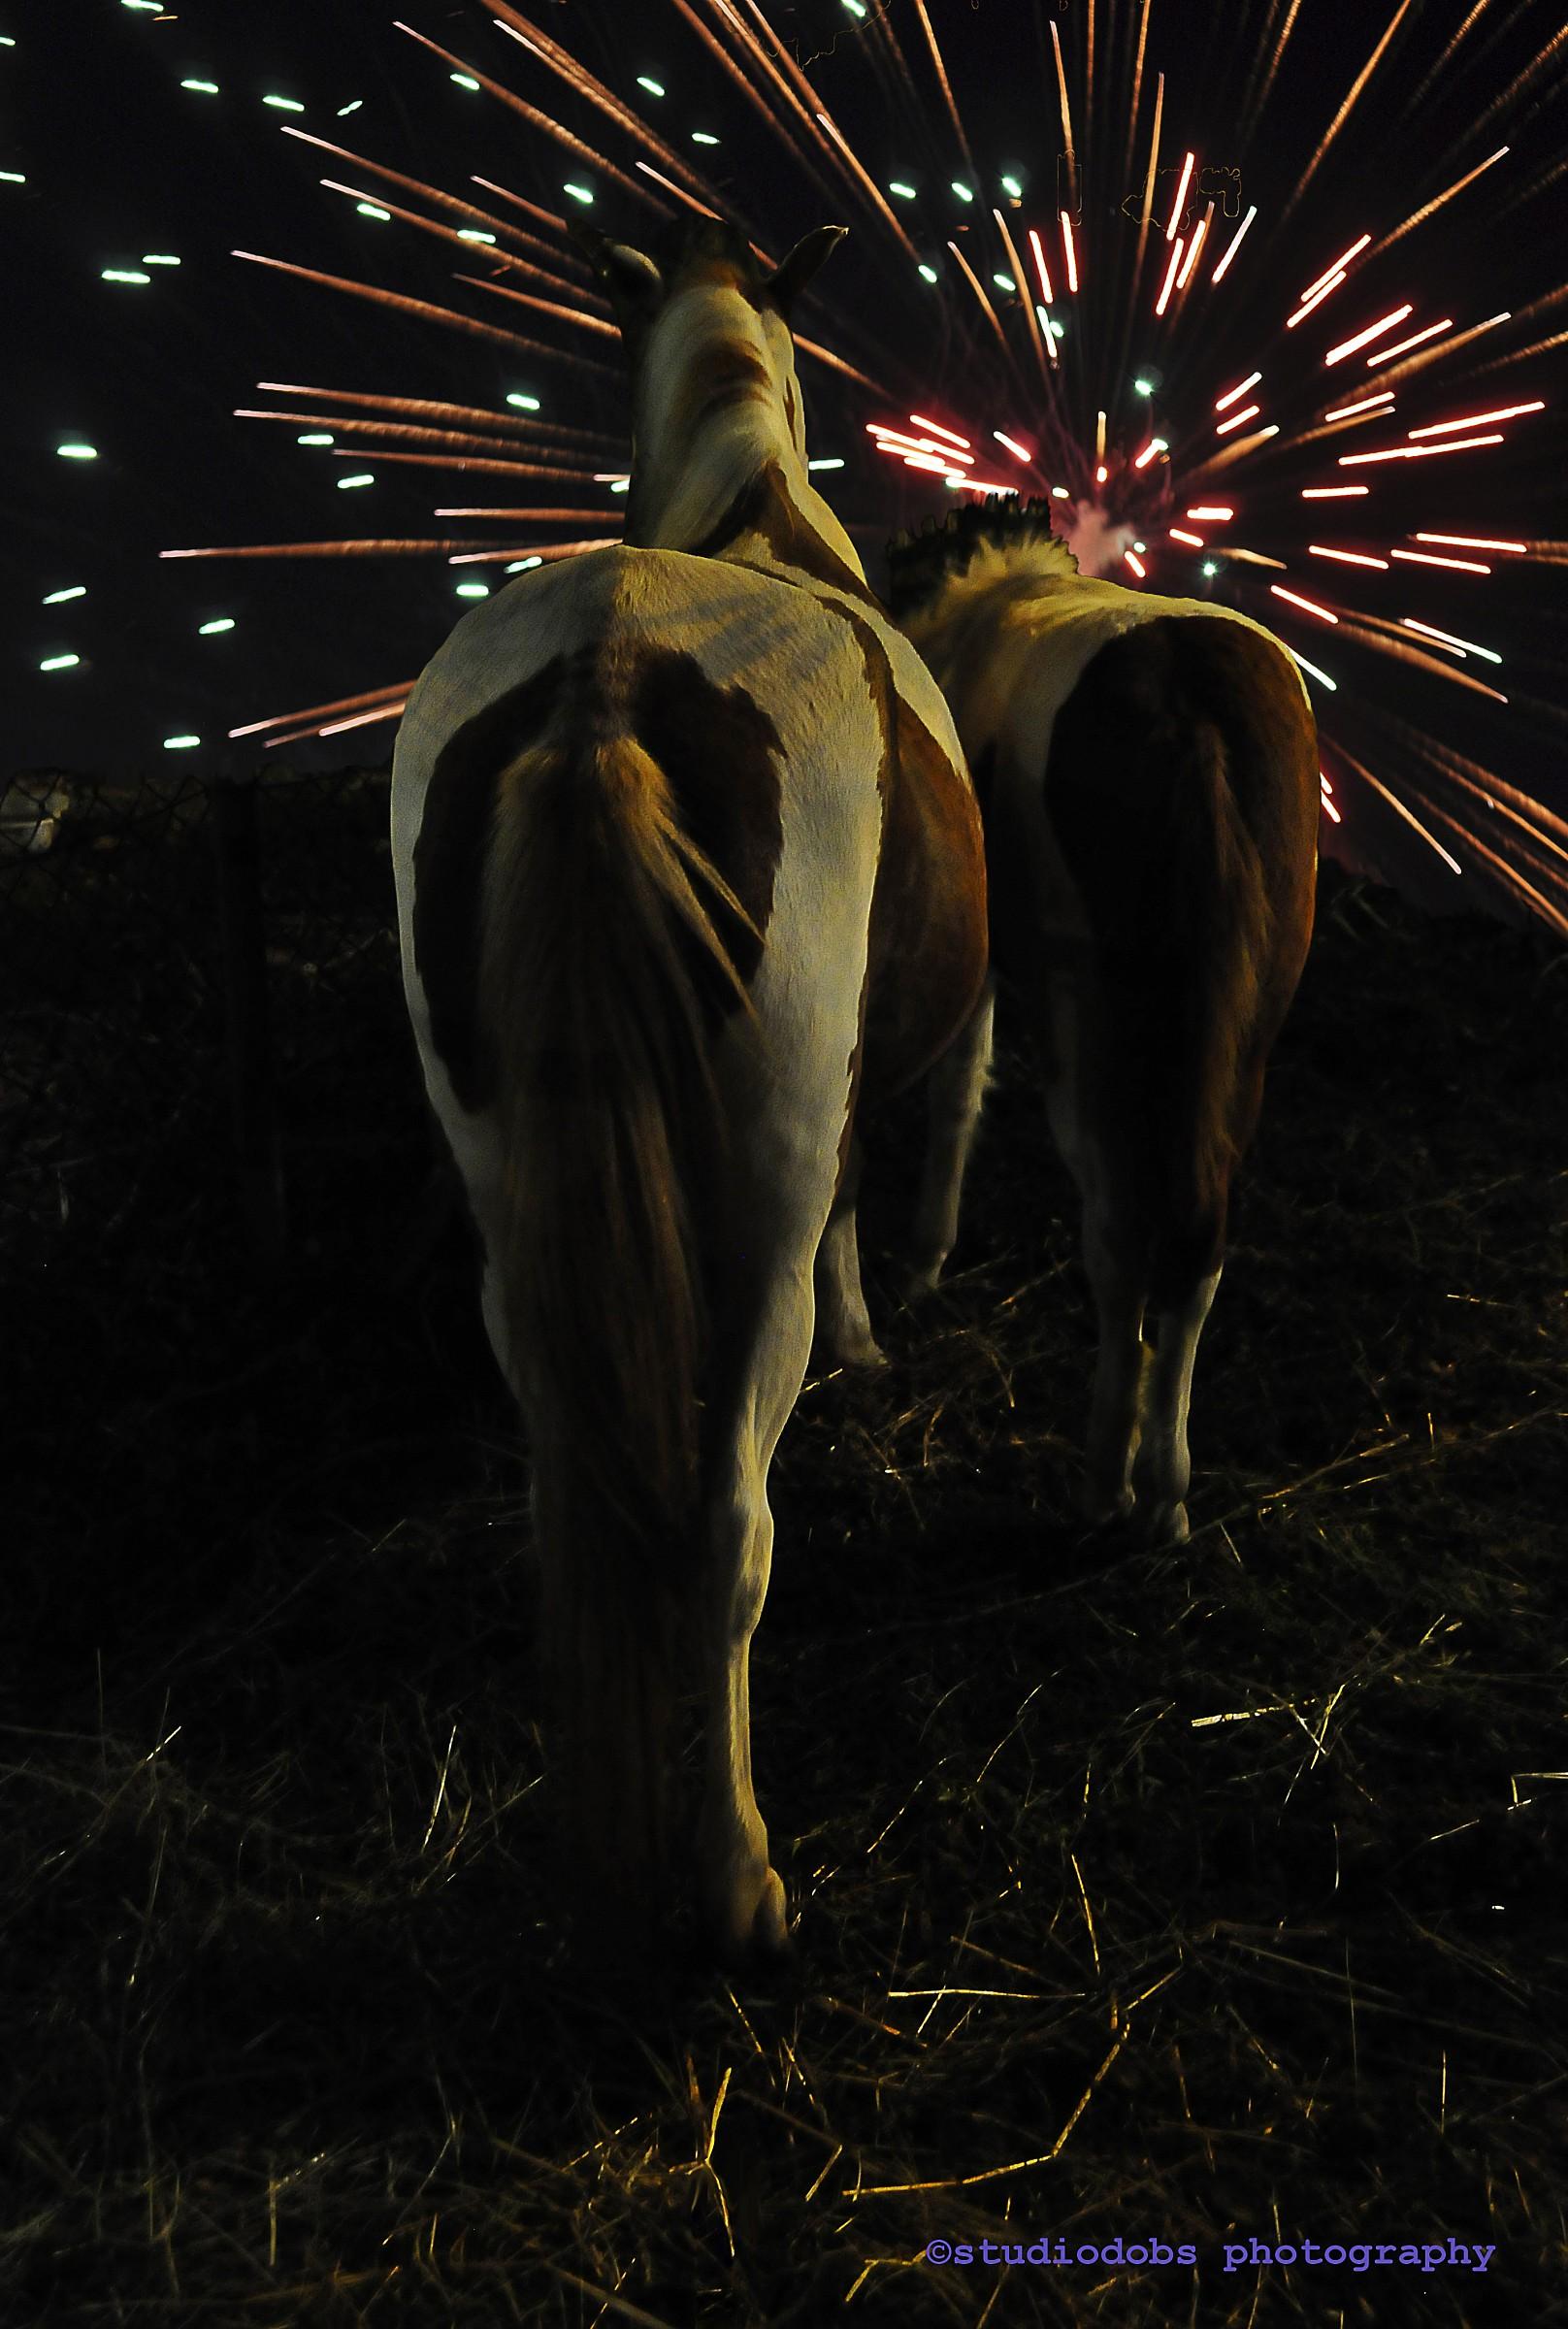 Watching fireworks...